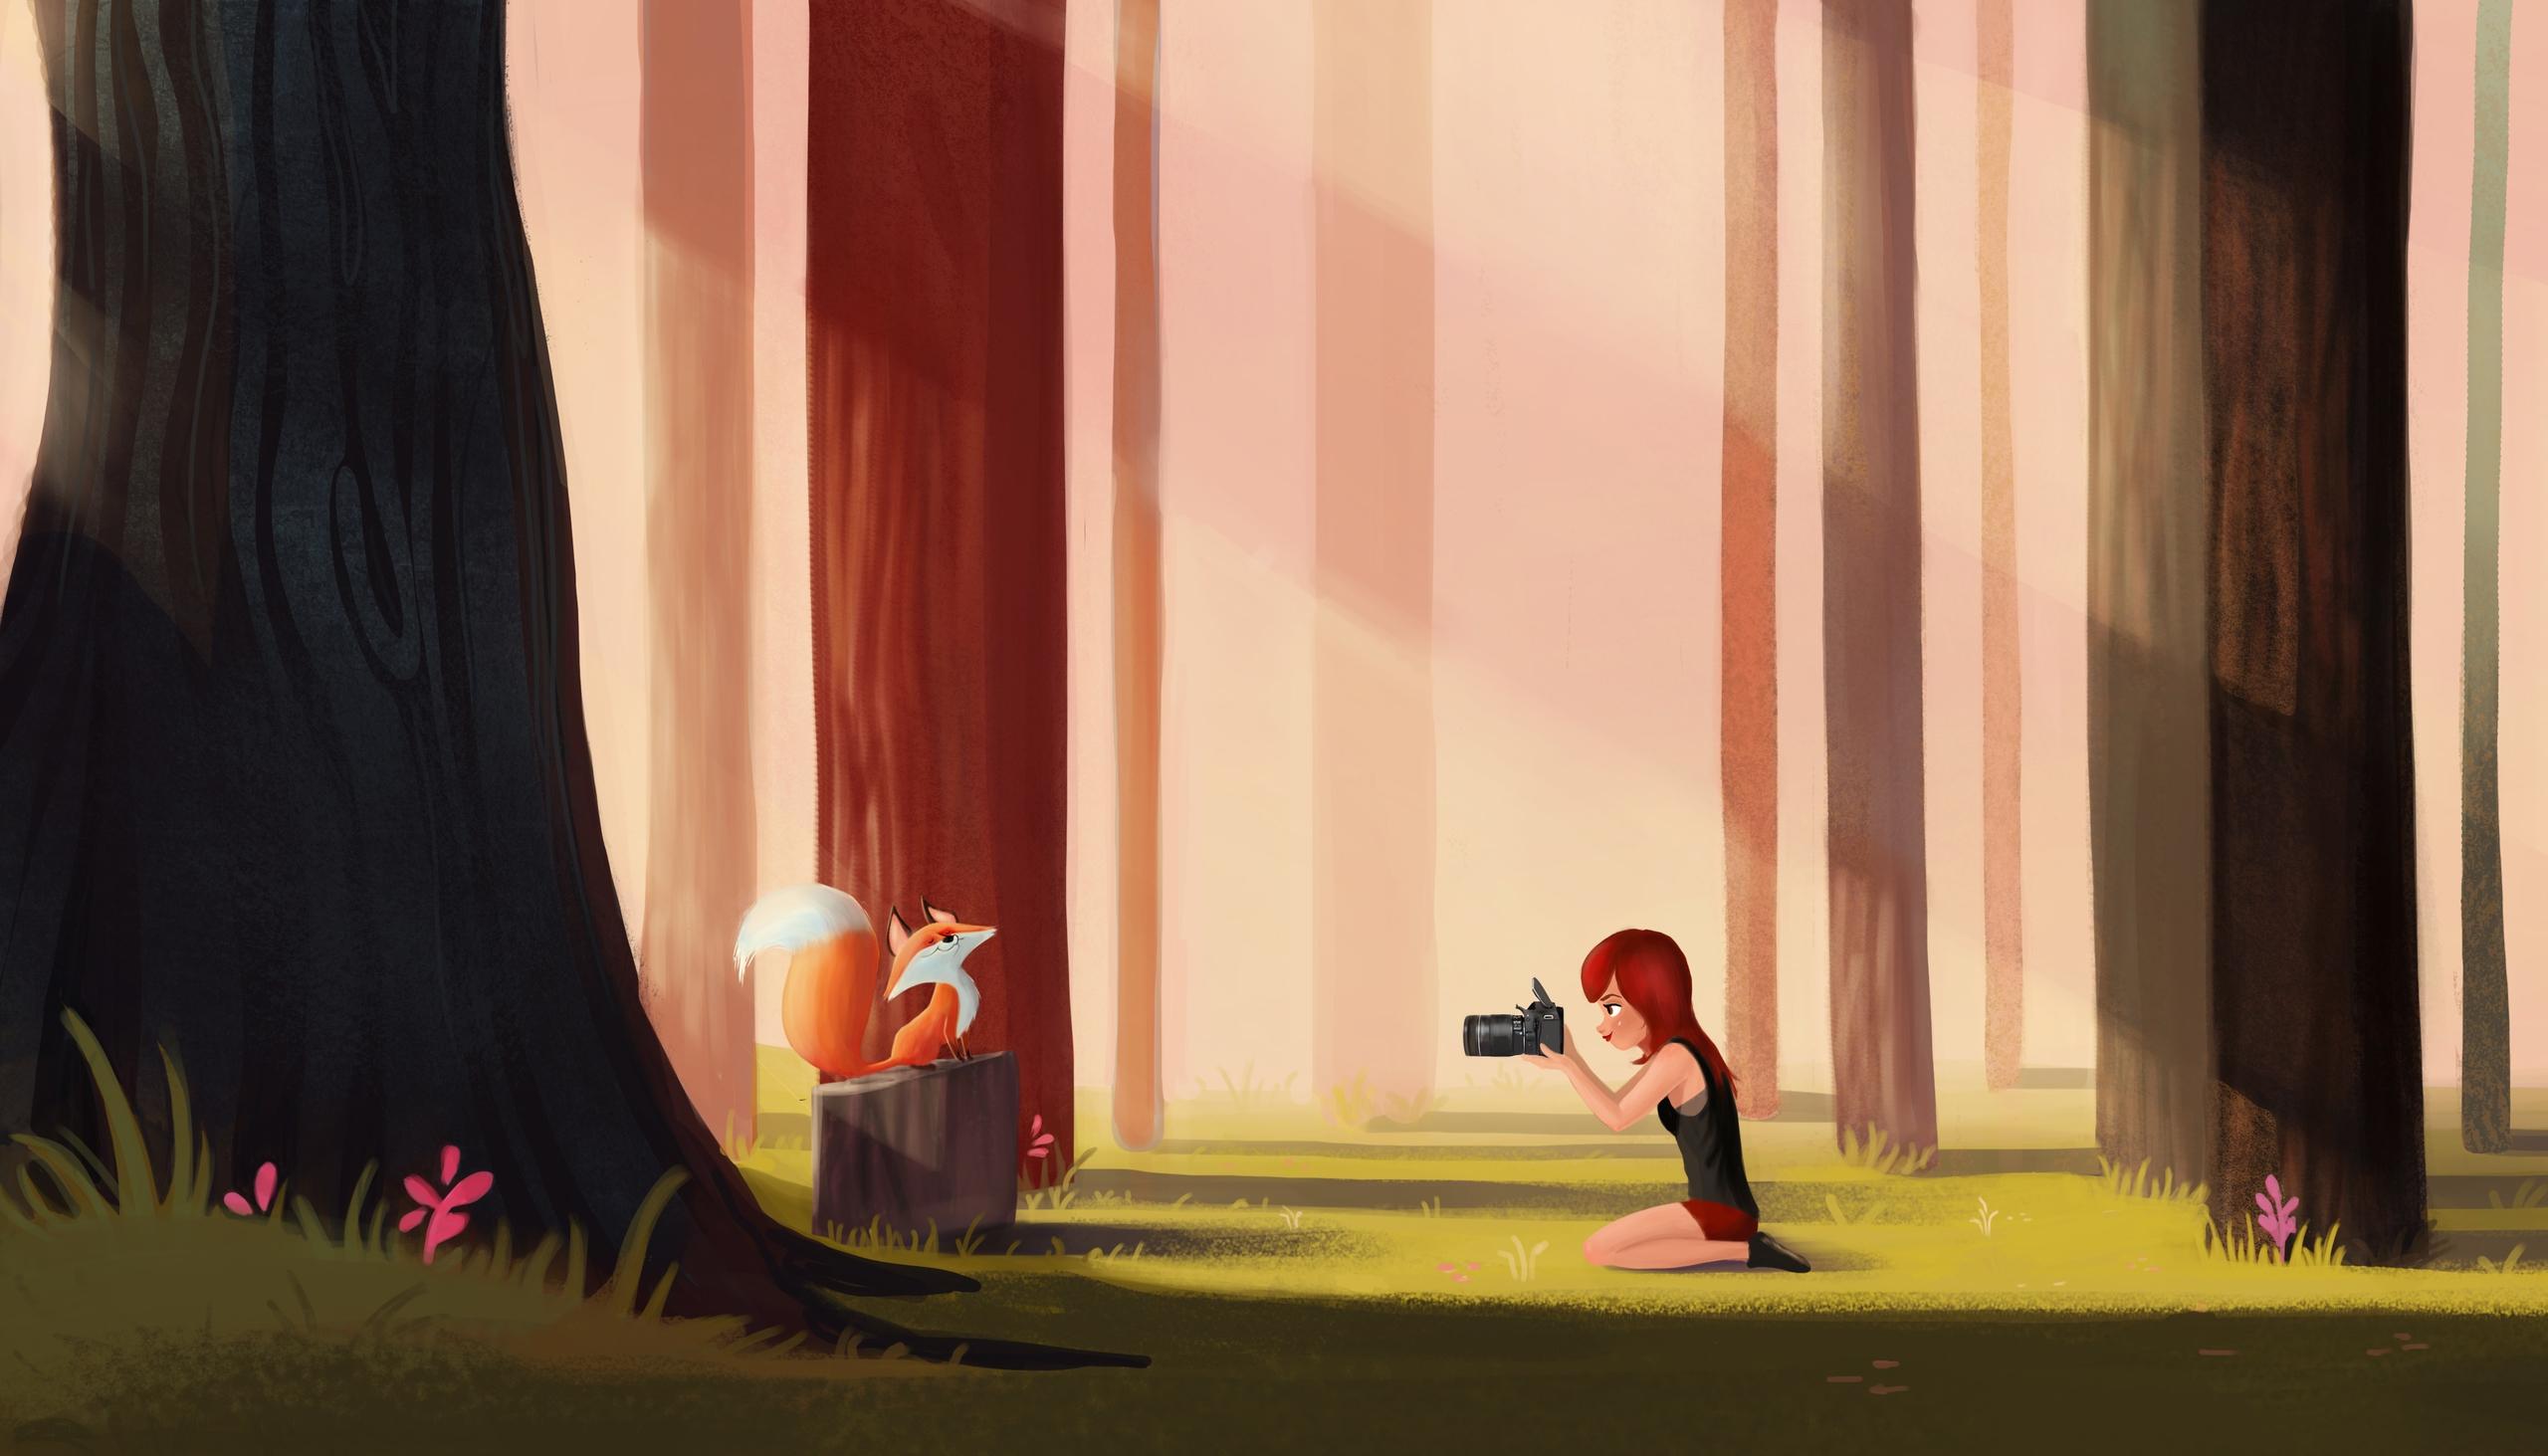 Fox - fox, girl, environment, illustration - ashleyodell | ello